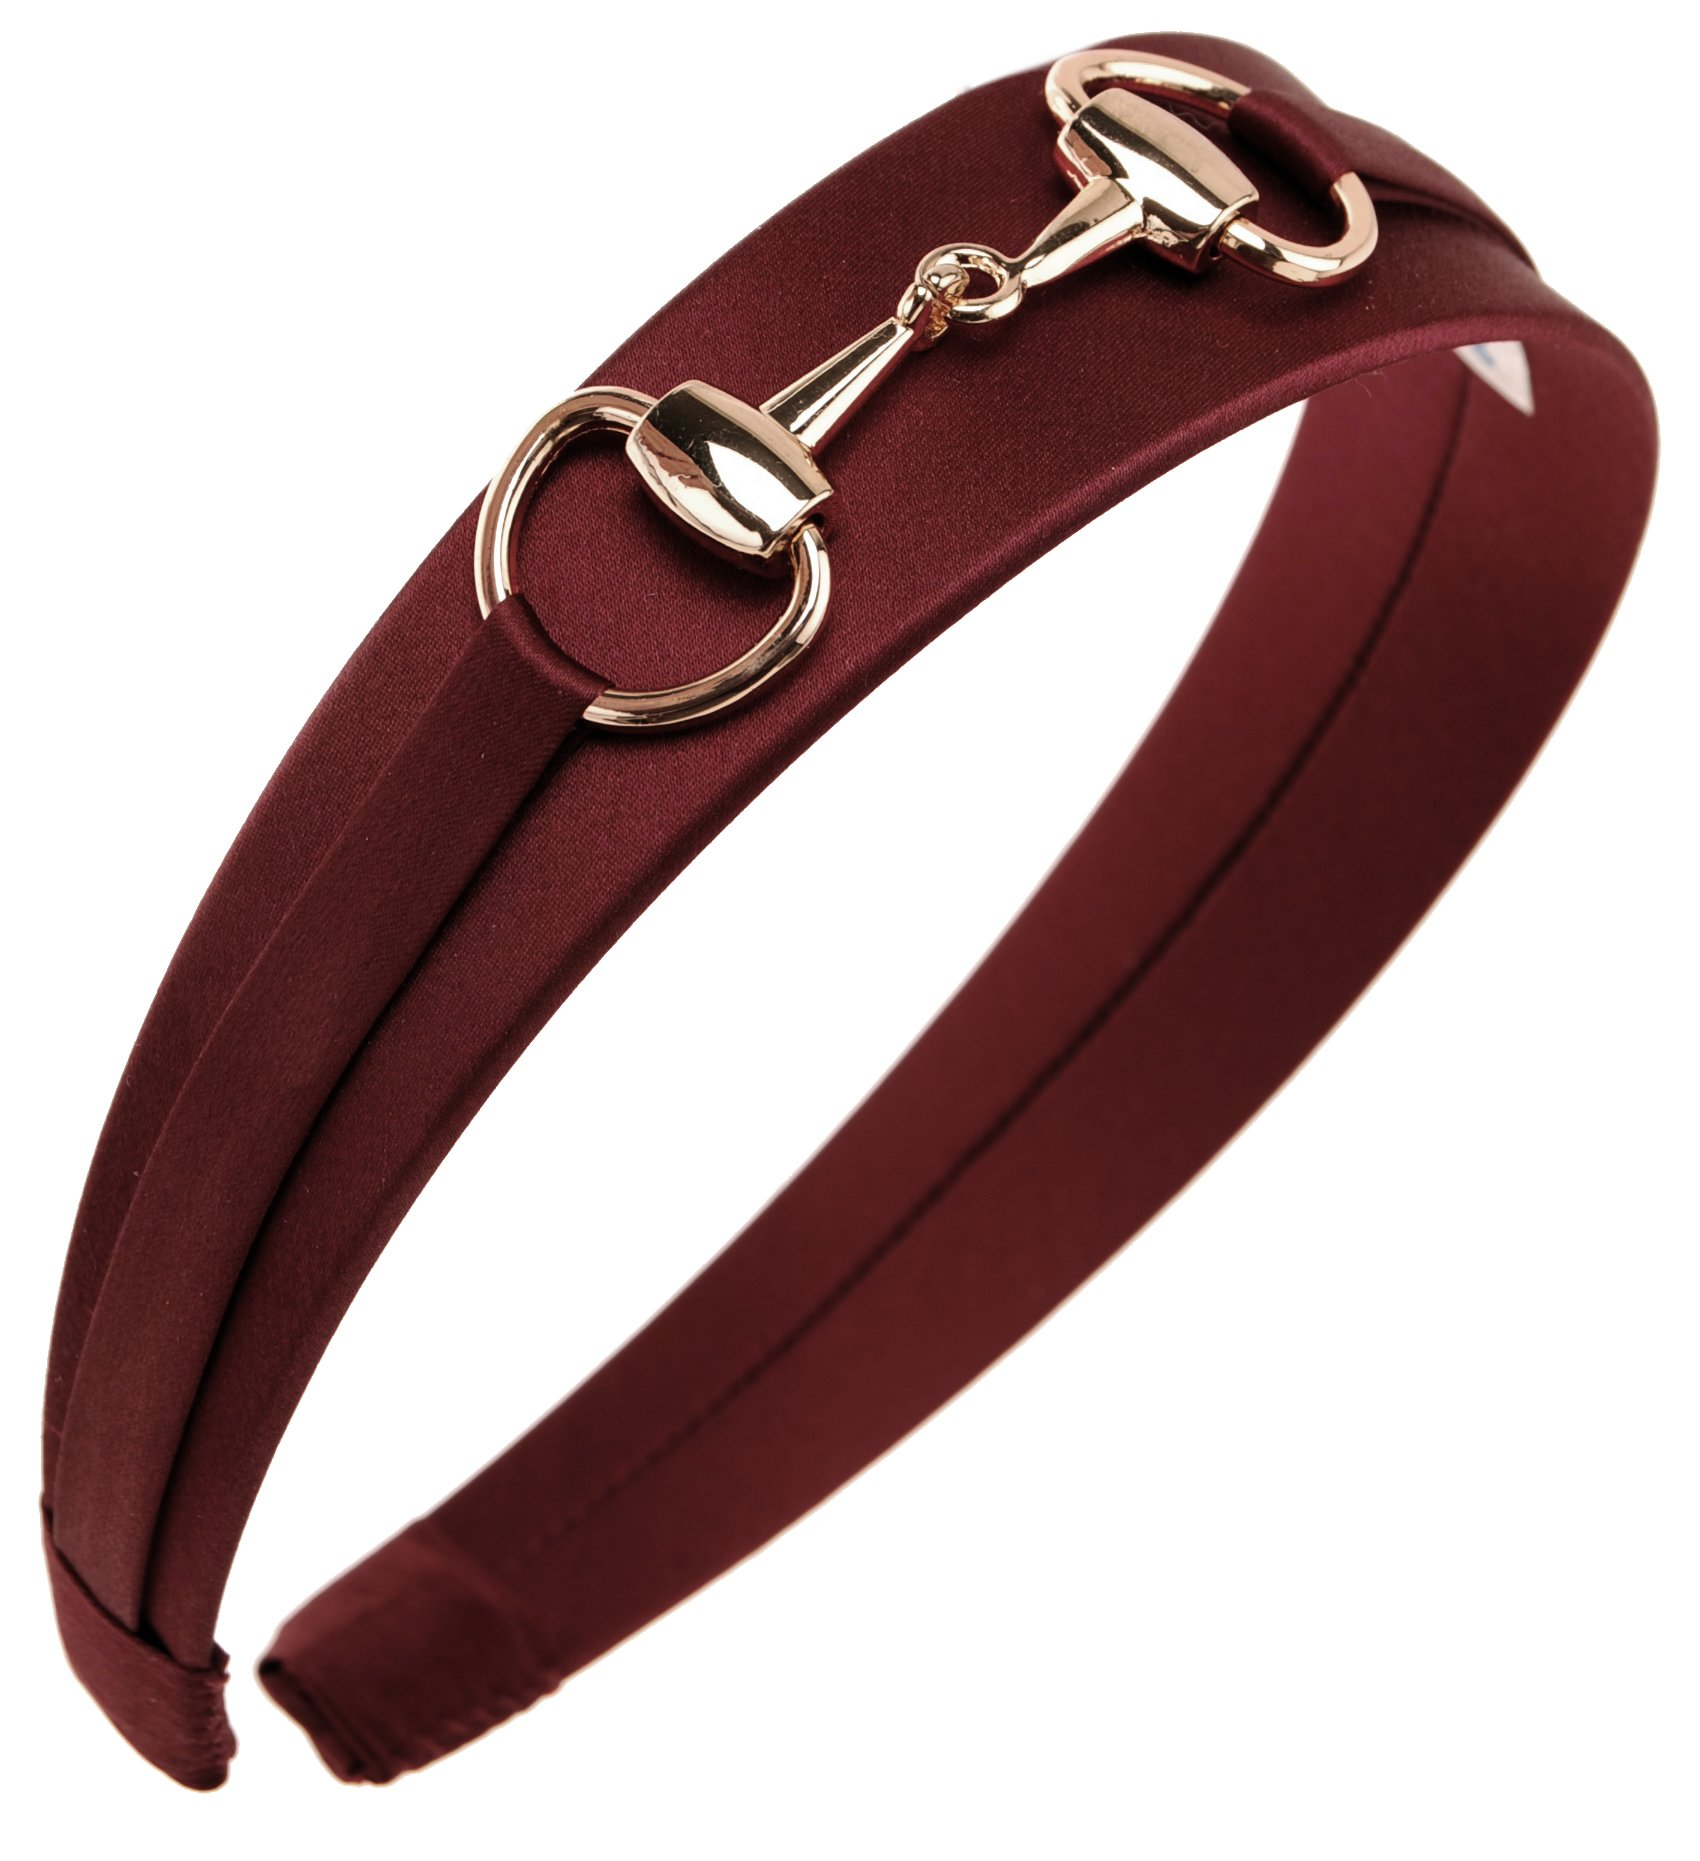 L. Erickson USA Bit Headband - Silk Charmeuse Merlot